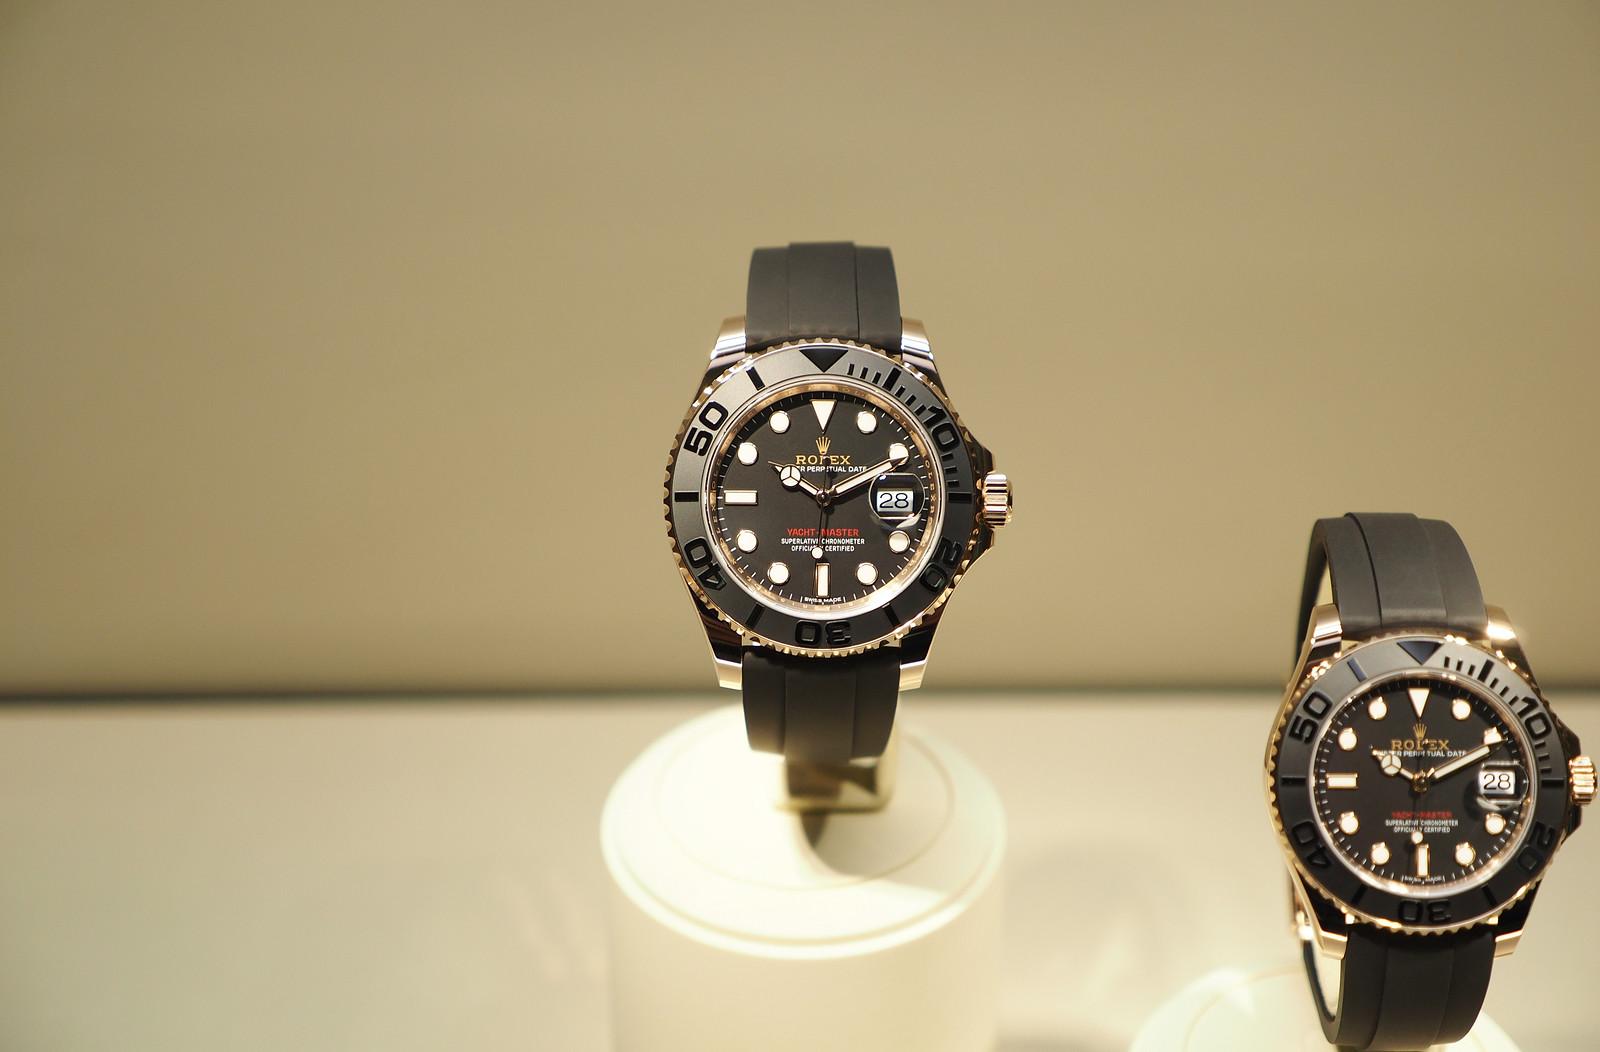 Naziv: Rolex-Yachtmaster-Ceramic-Bezel-Everose-Gold-thumb-1600x1052-25610.jpg, pregleda: 398, veličina: 220,2 KB